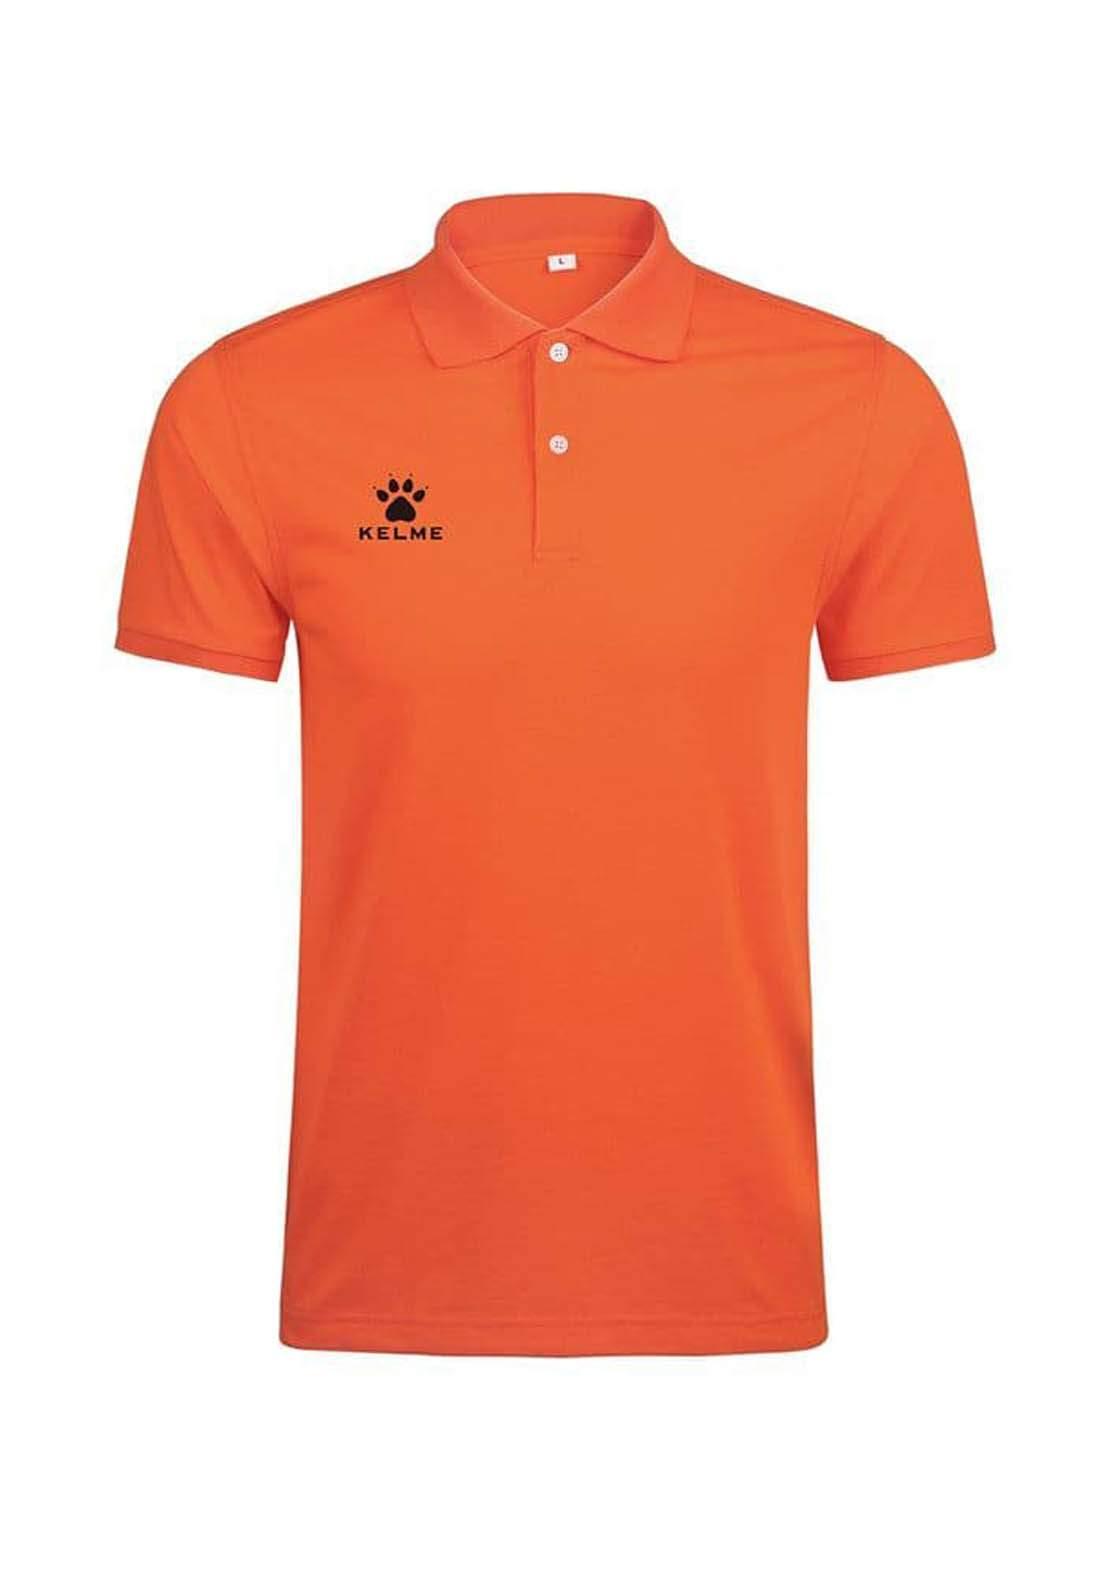 تيشيرت رجالي رياضي برتقالي اللون من Kelme